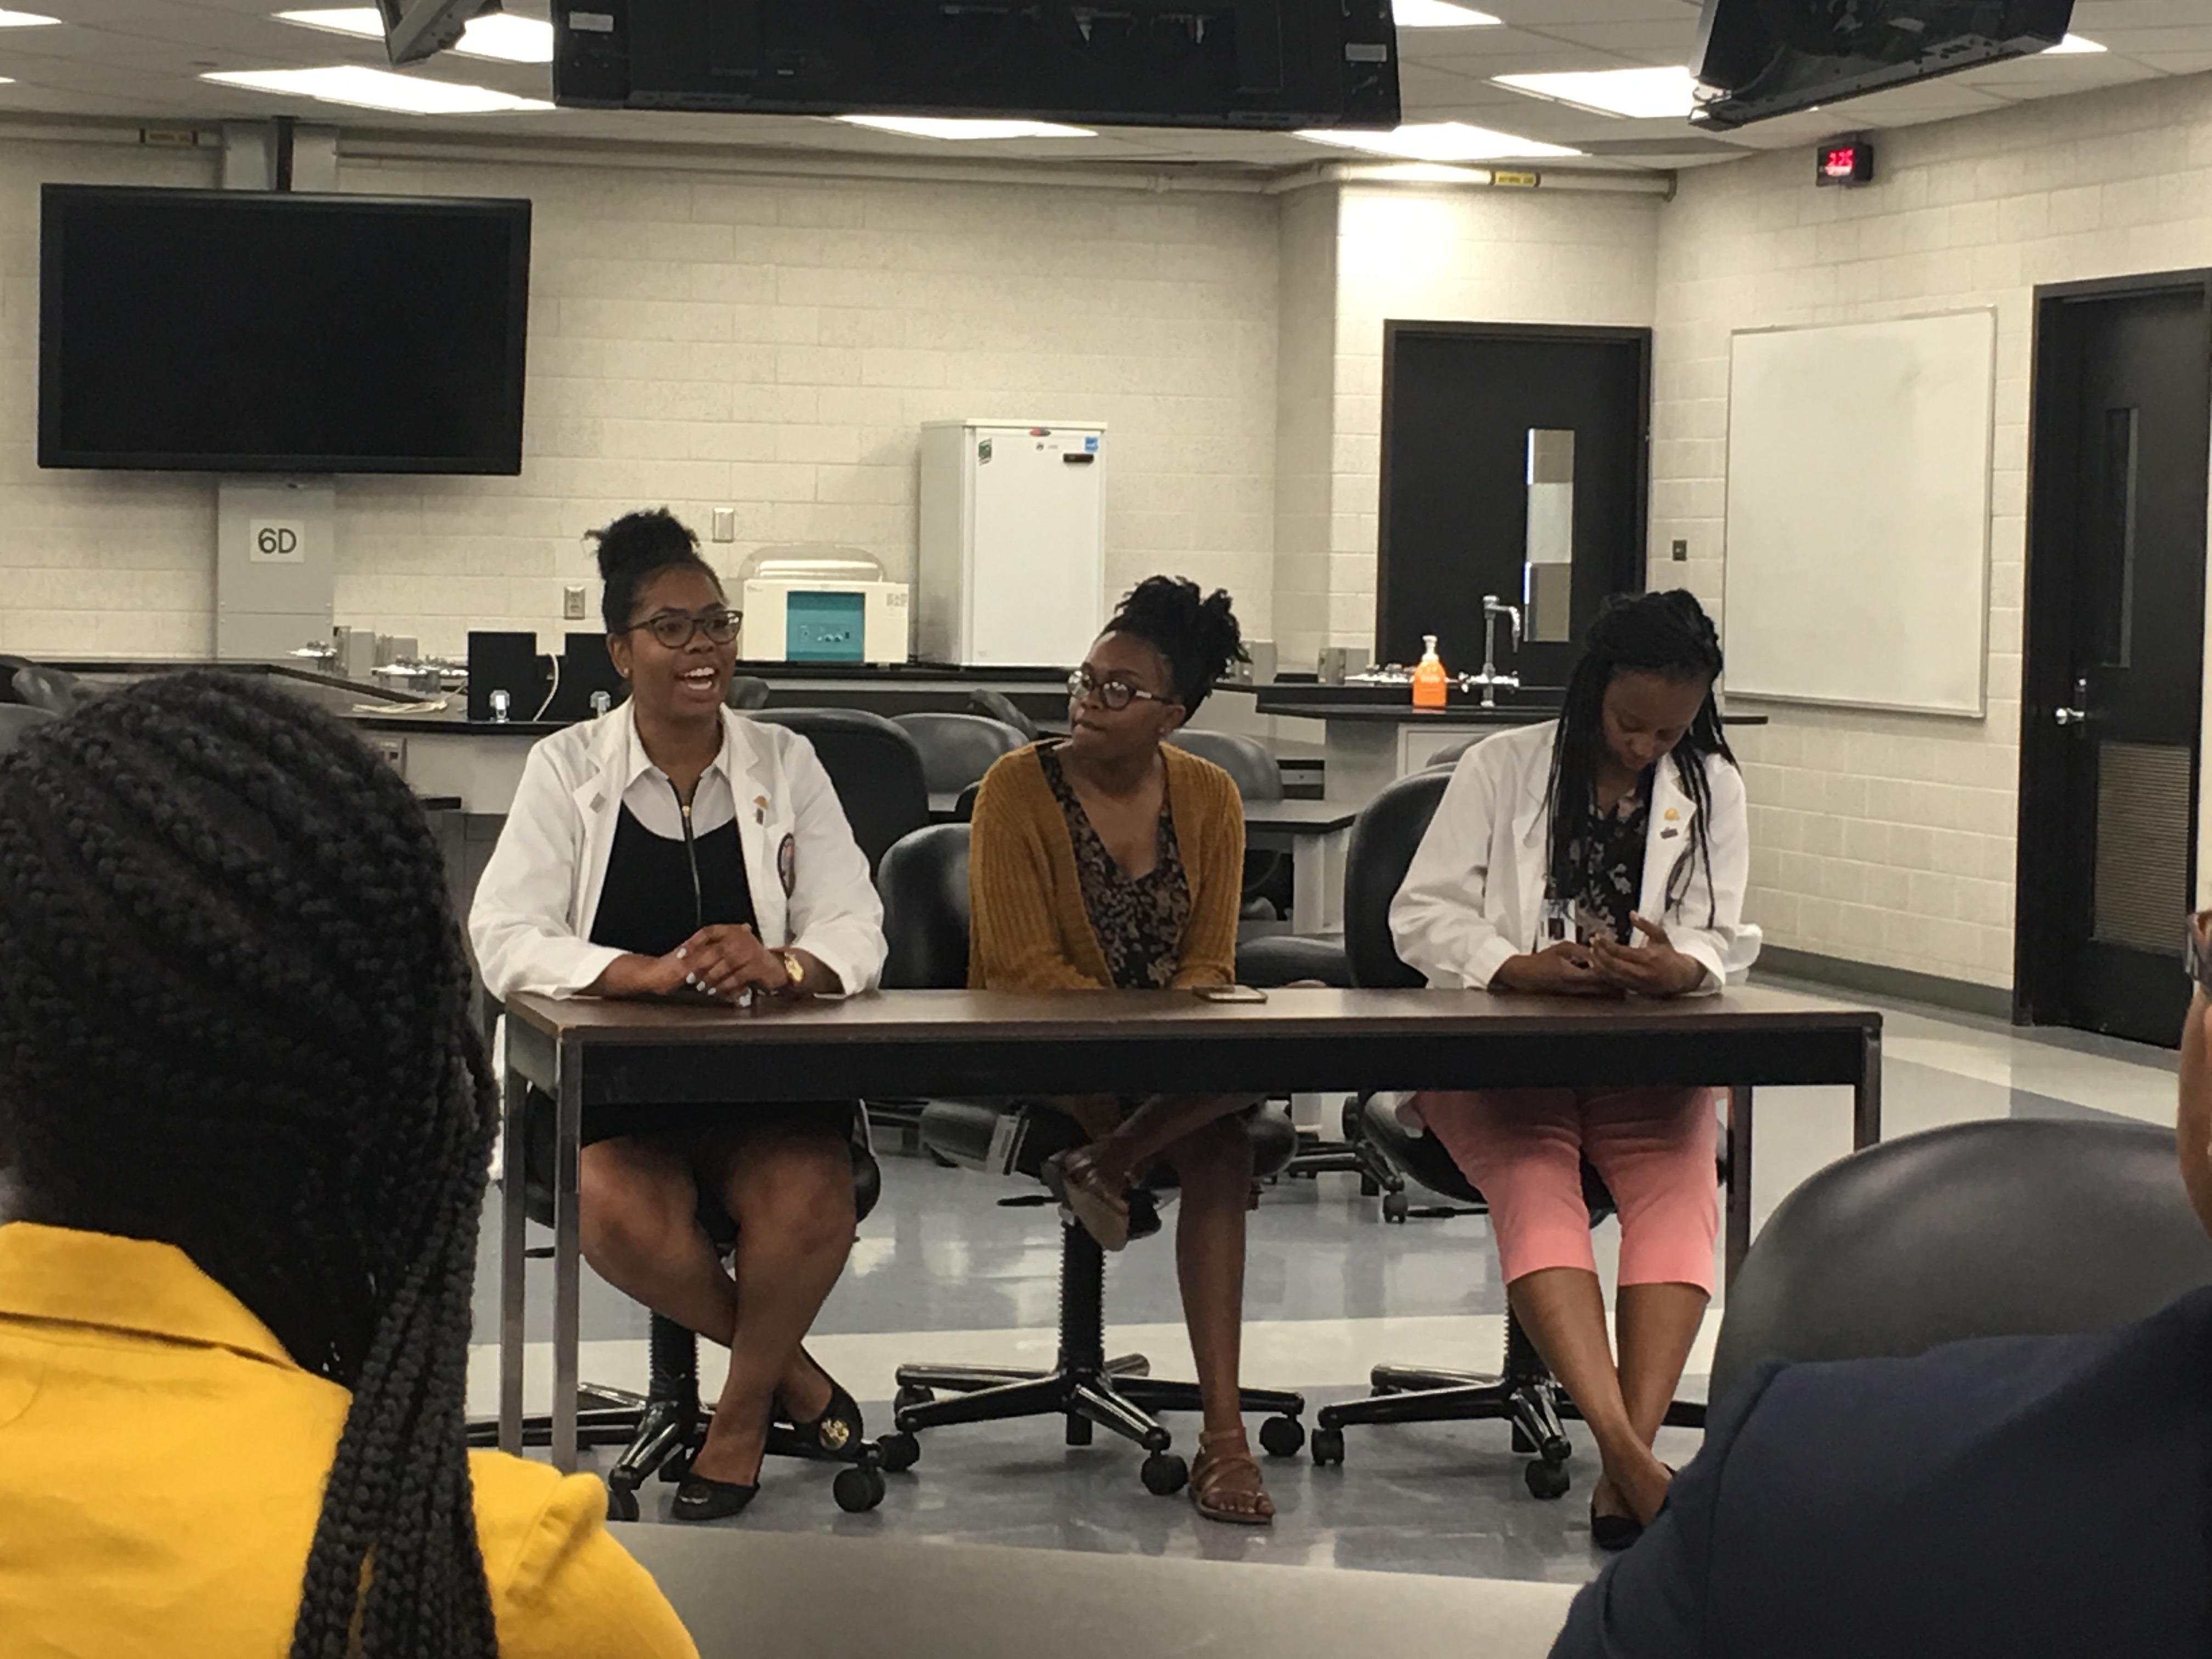 LSU-New Orleans School of Medicine Tour – Comprehensive